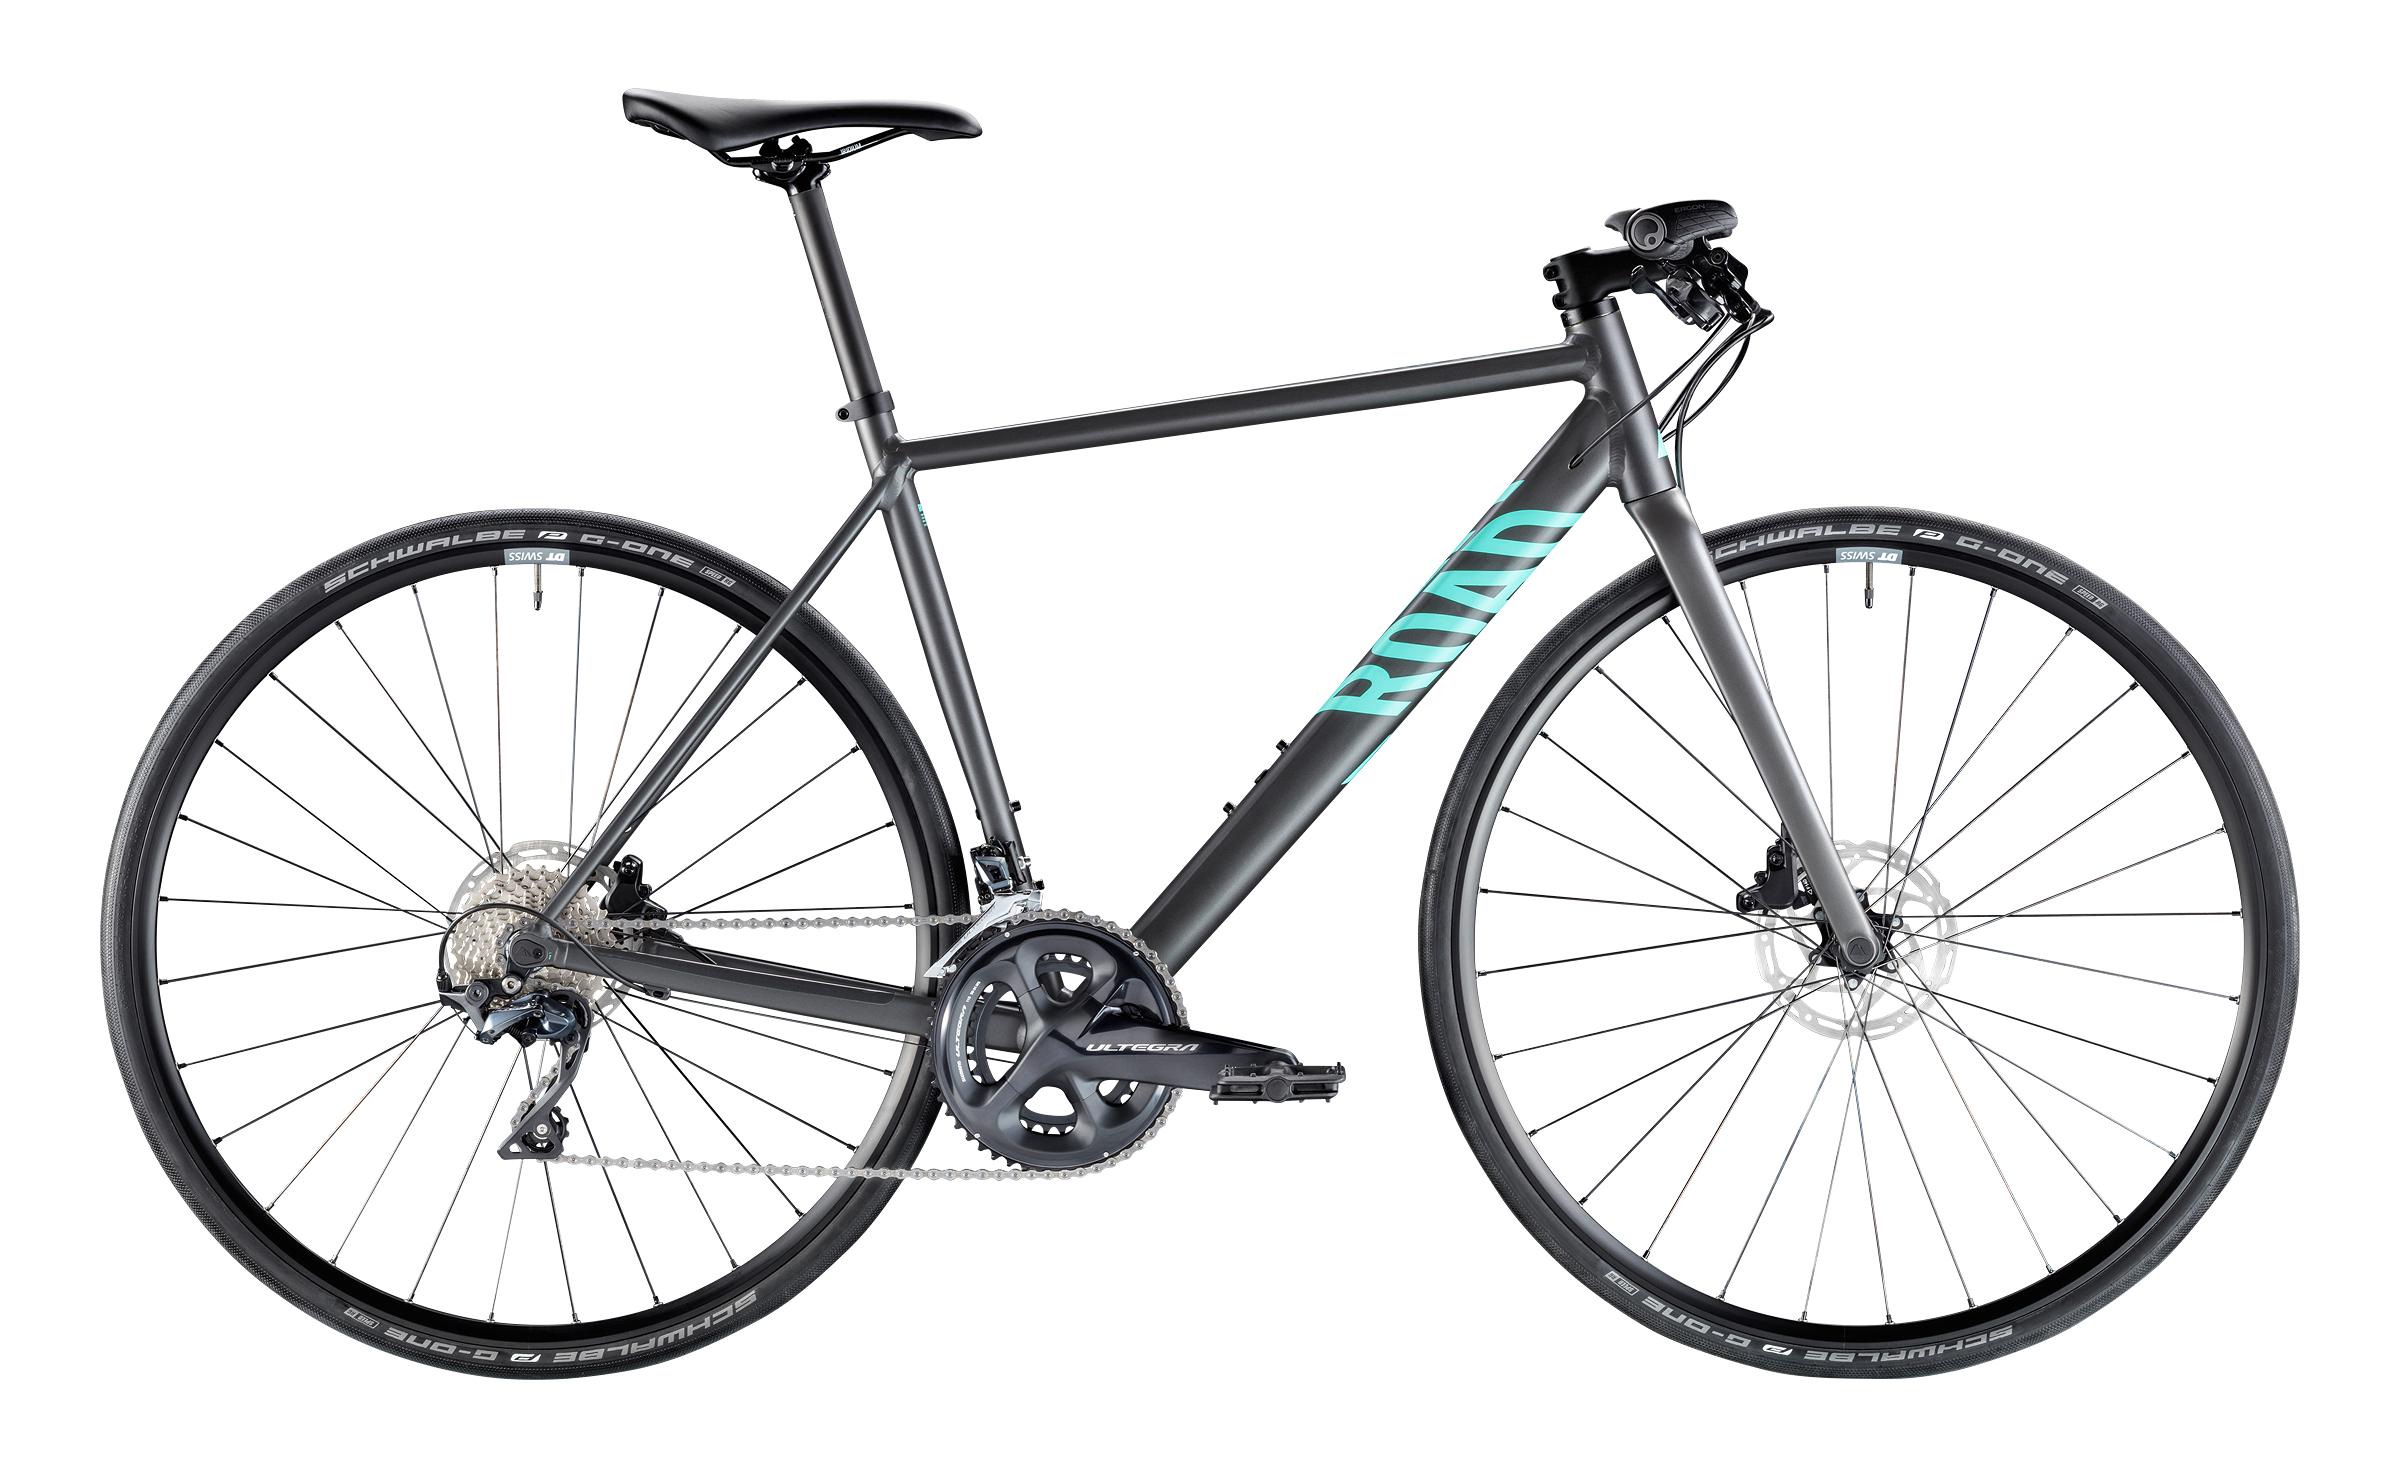 CANYON ROADLITE AL SL 8.0; 2018 Fitnessbike mit ULTEGRA Ausstattung inkl. Versandkosten